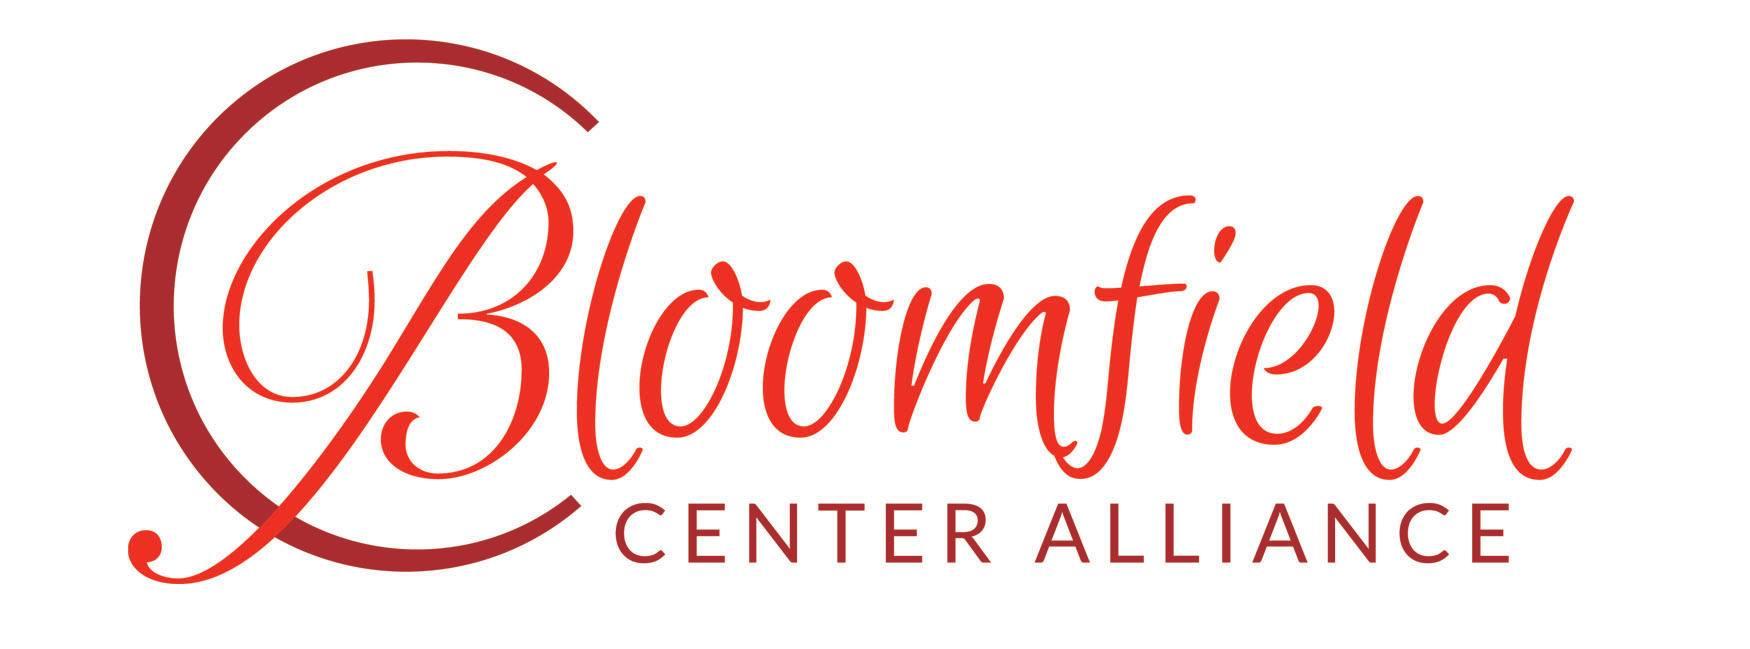 Bloomfield Center Alliance logo.